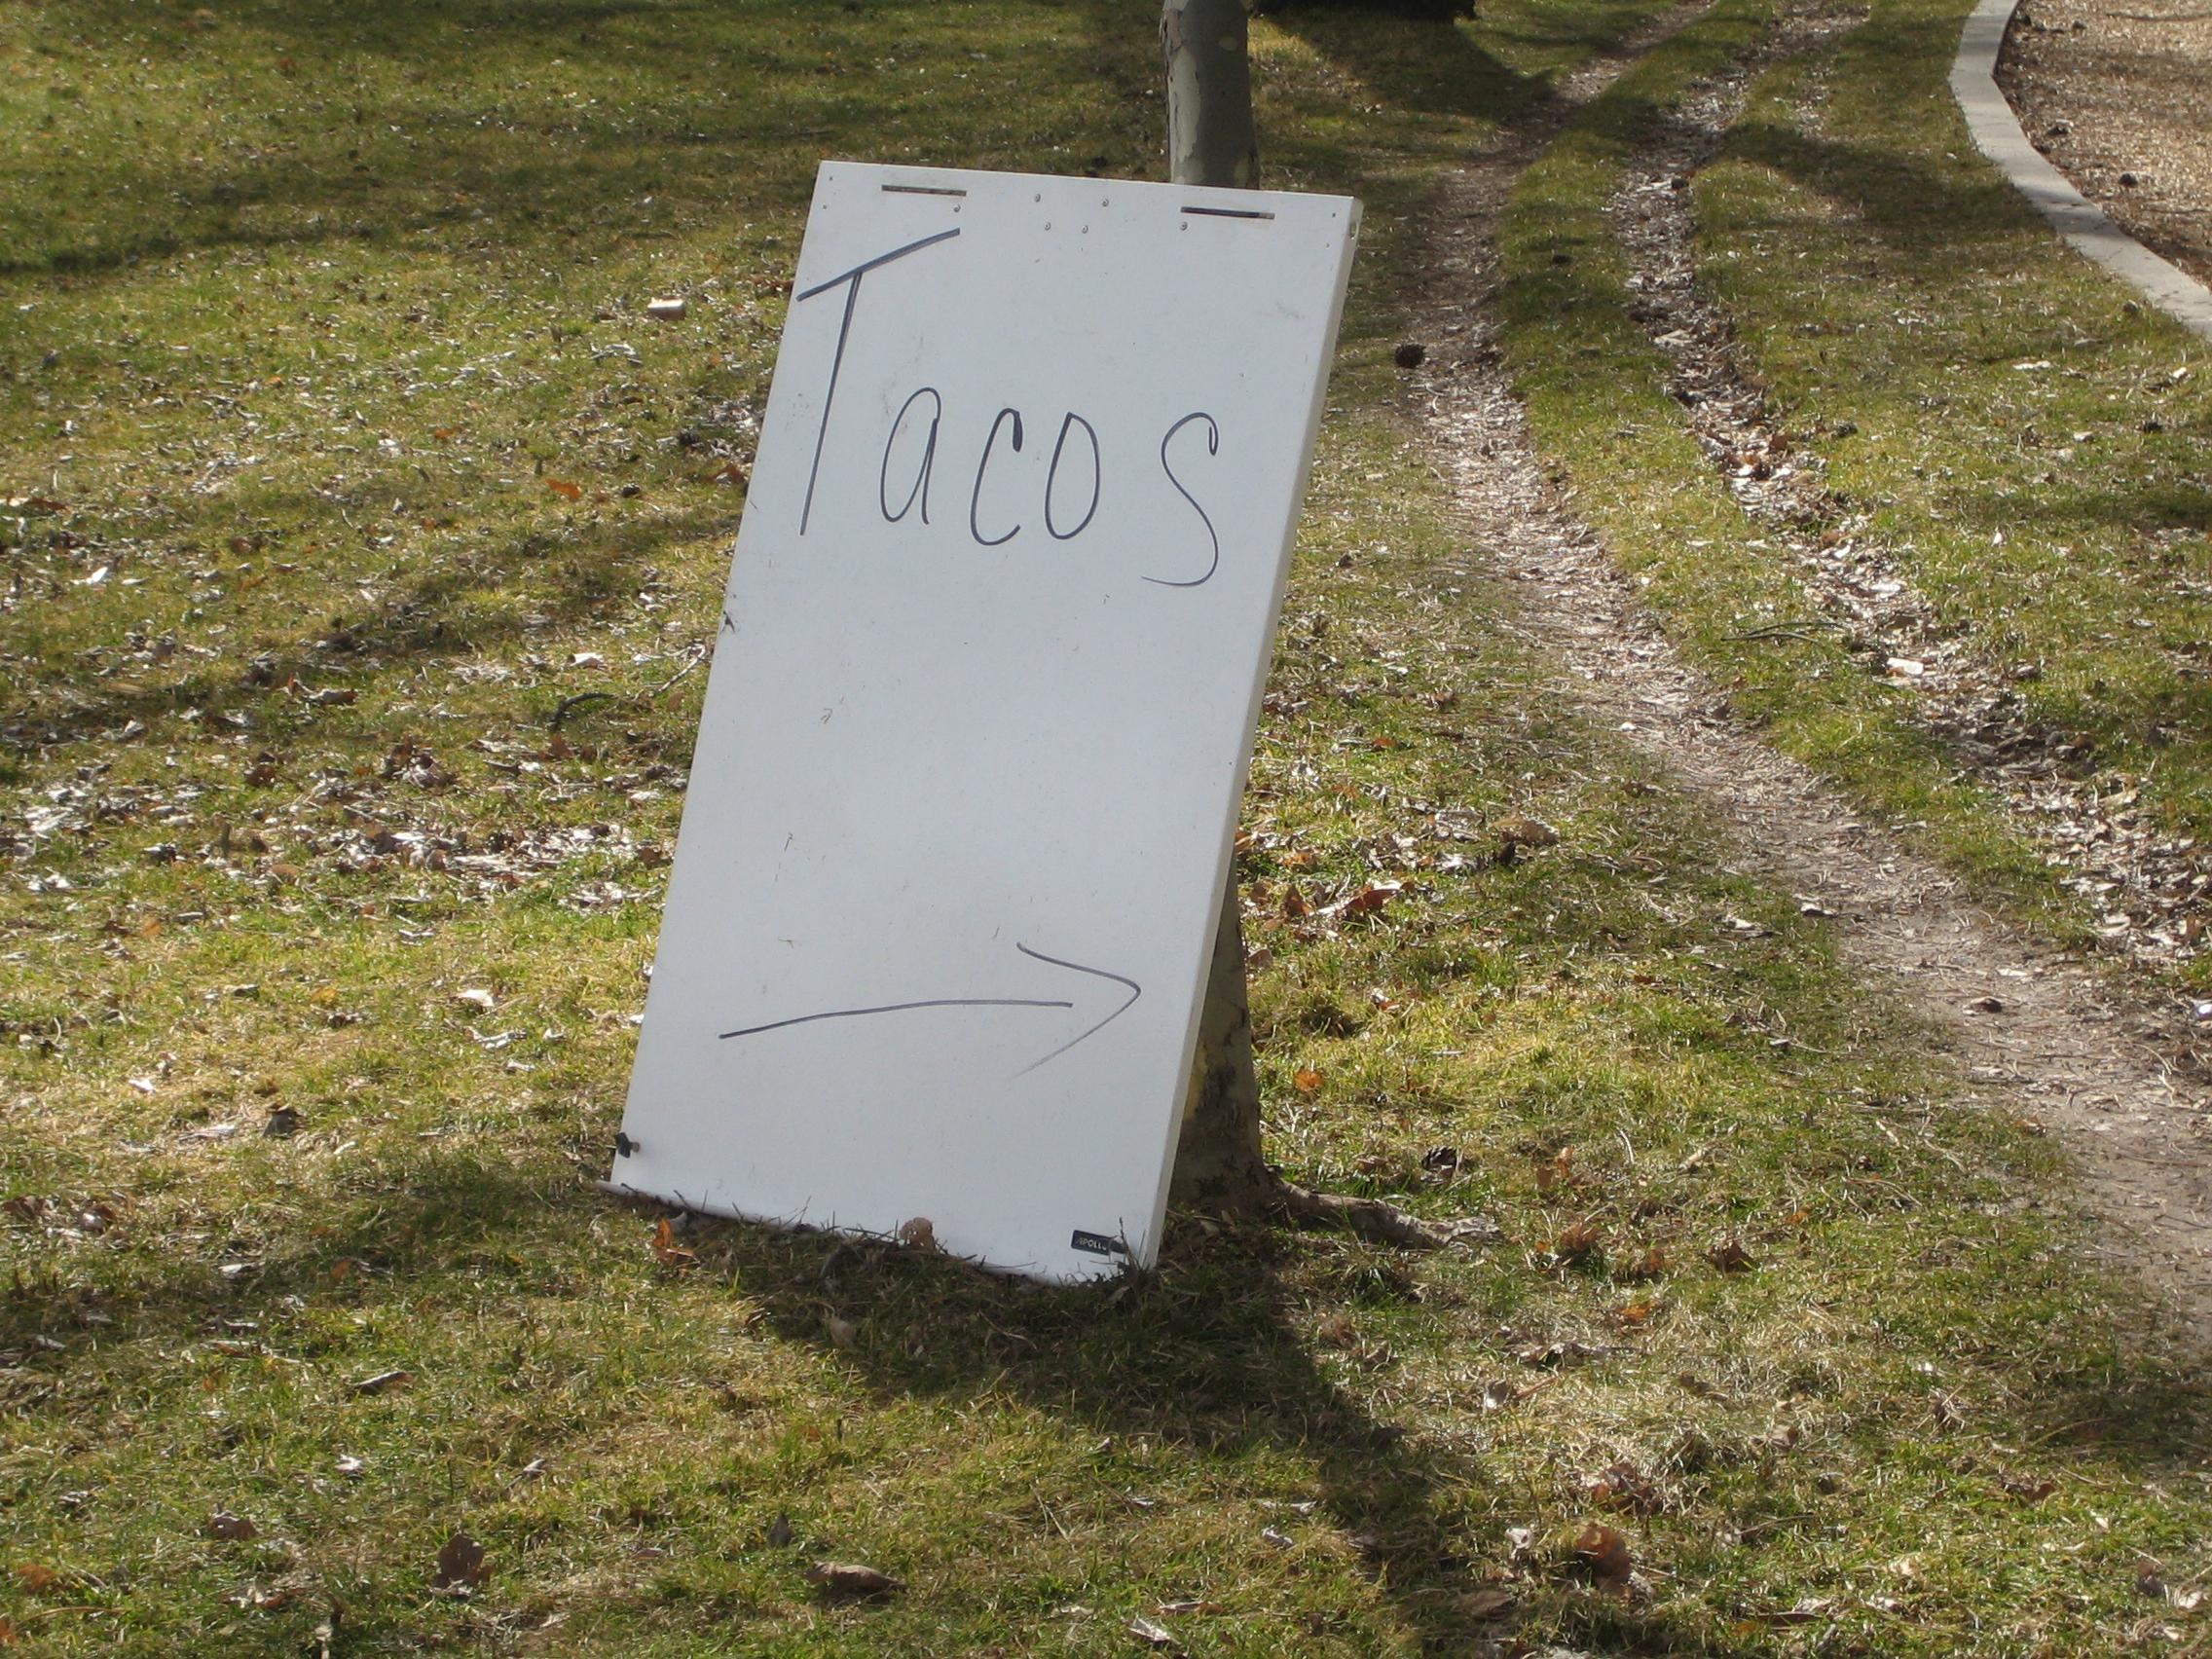 tacos you say?